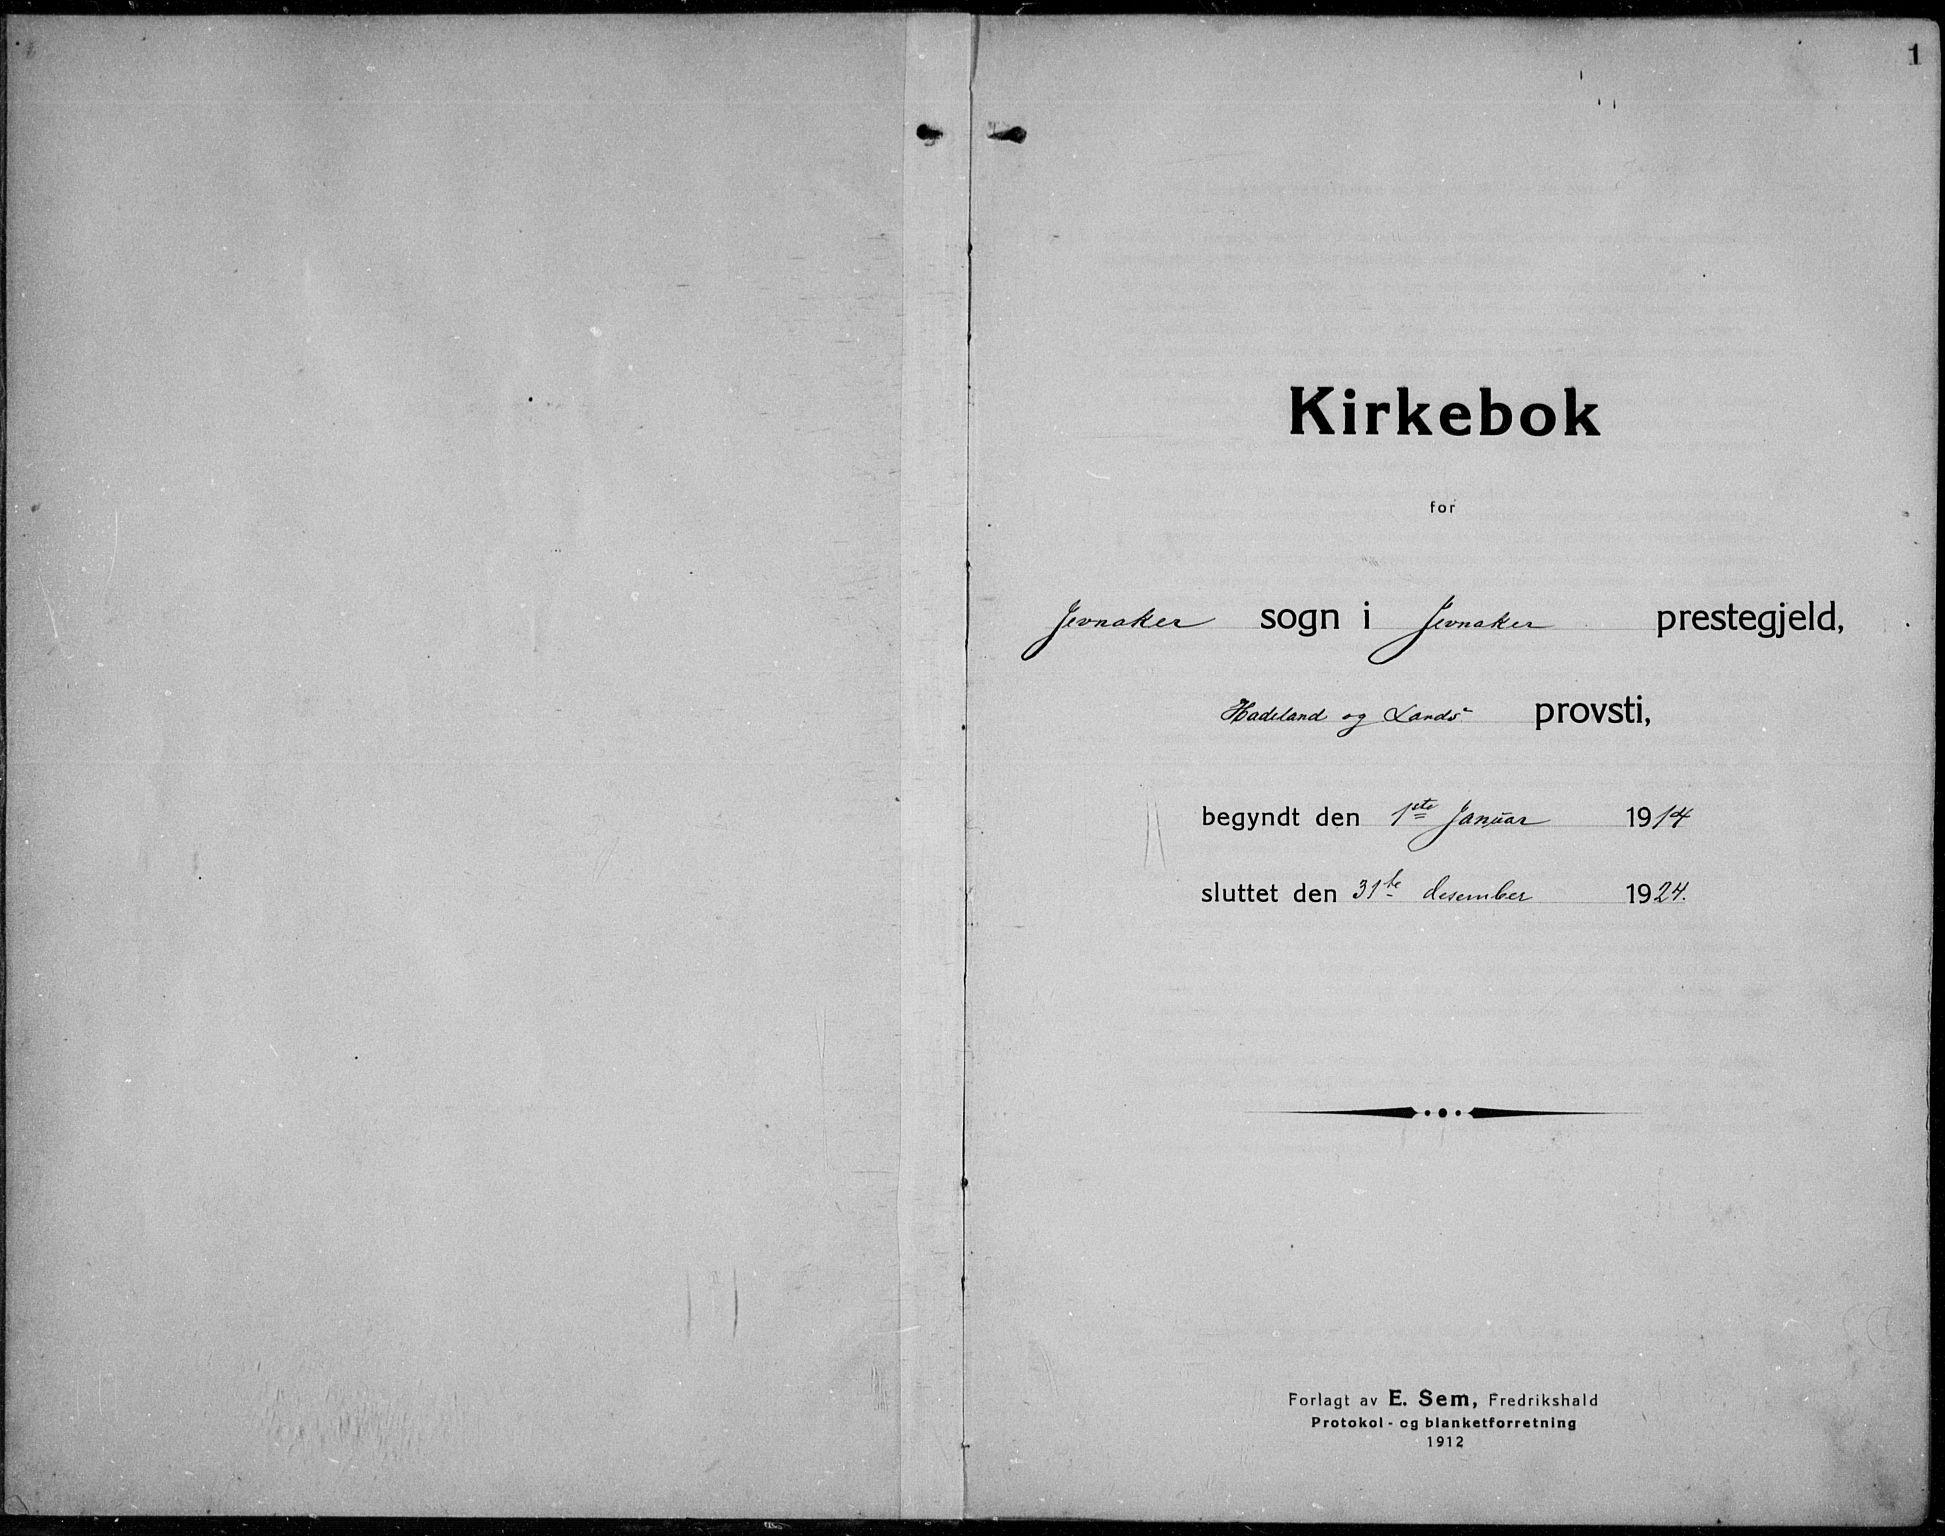 SAH, Jevnaker prestekontor, Ministerialbok nr. 12, 1914-1924, s. 1